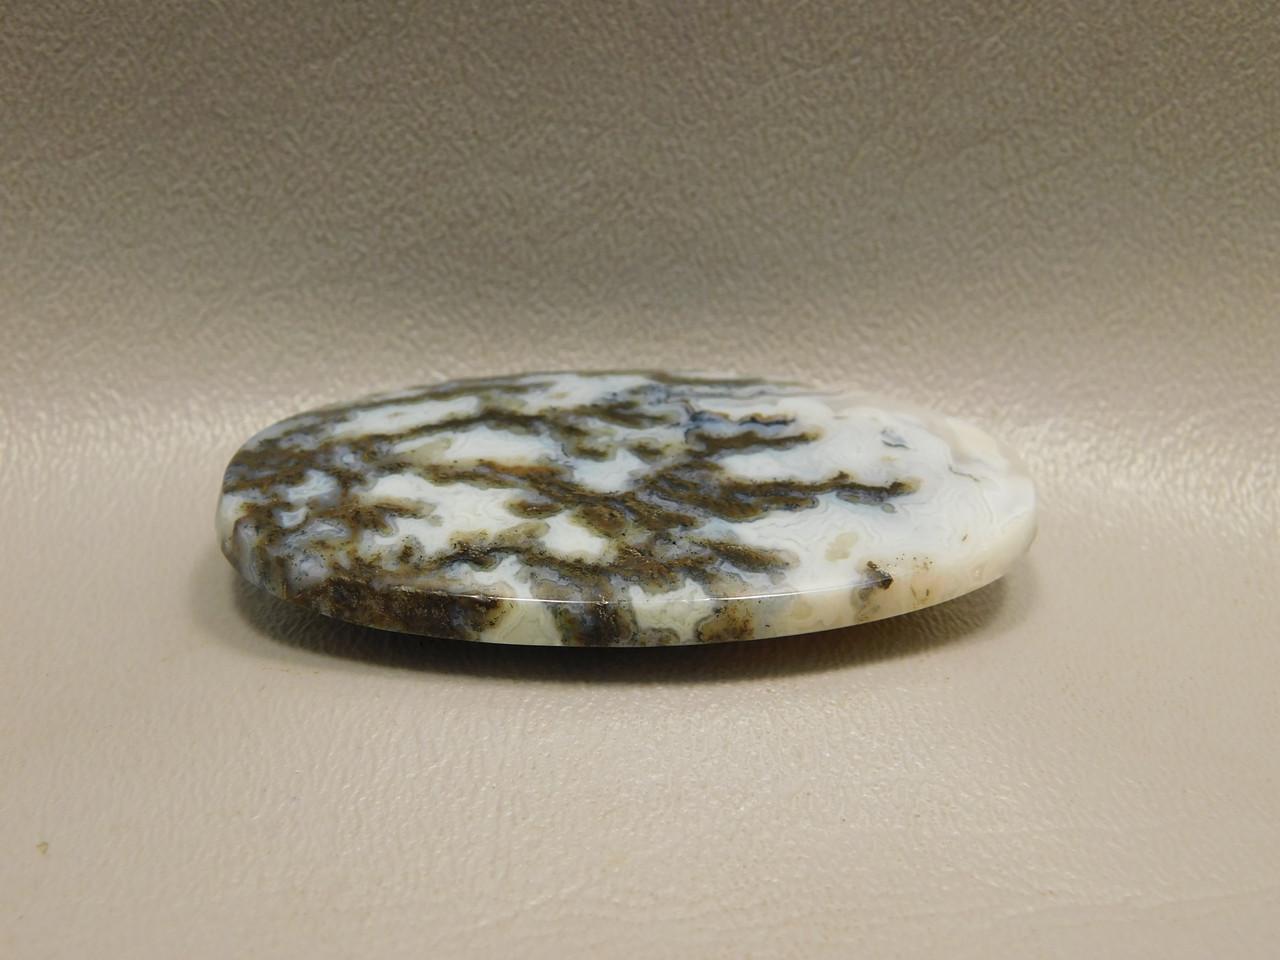 Graveyard Plume Agate Large Oval Designer Cabochon Stone #17